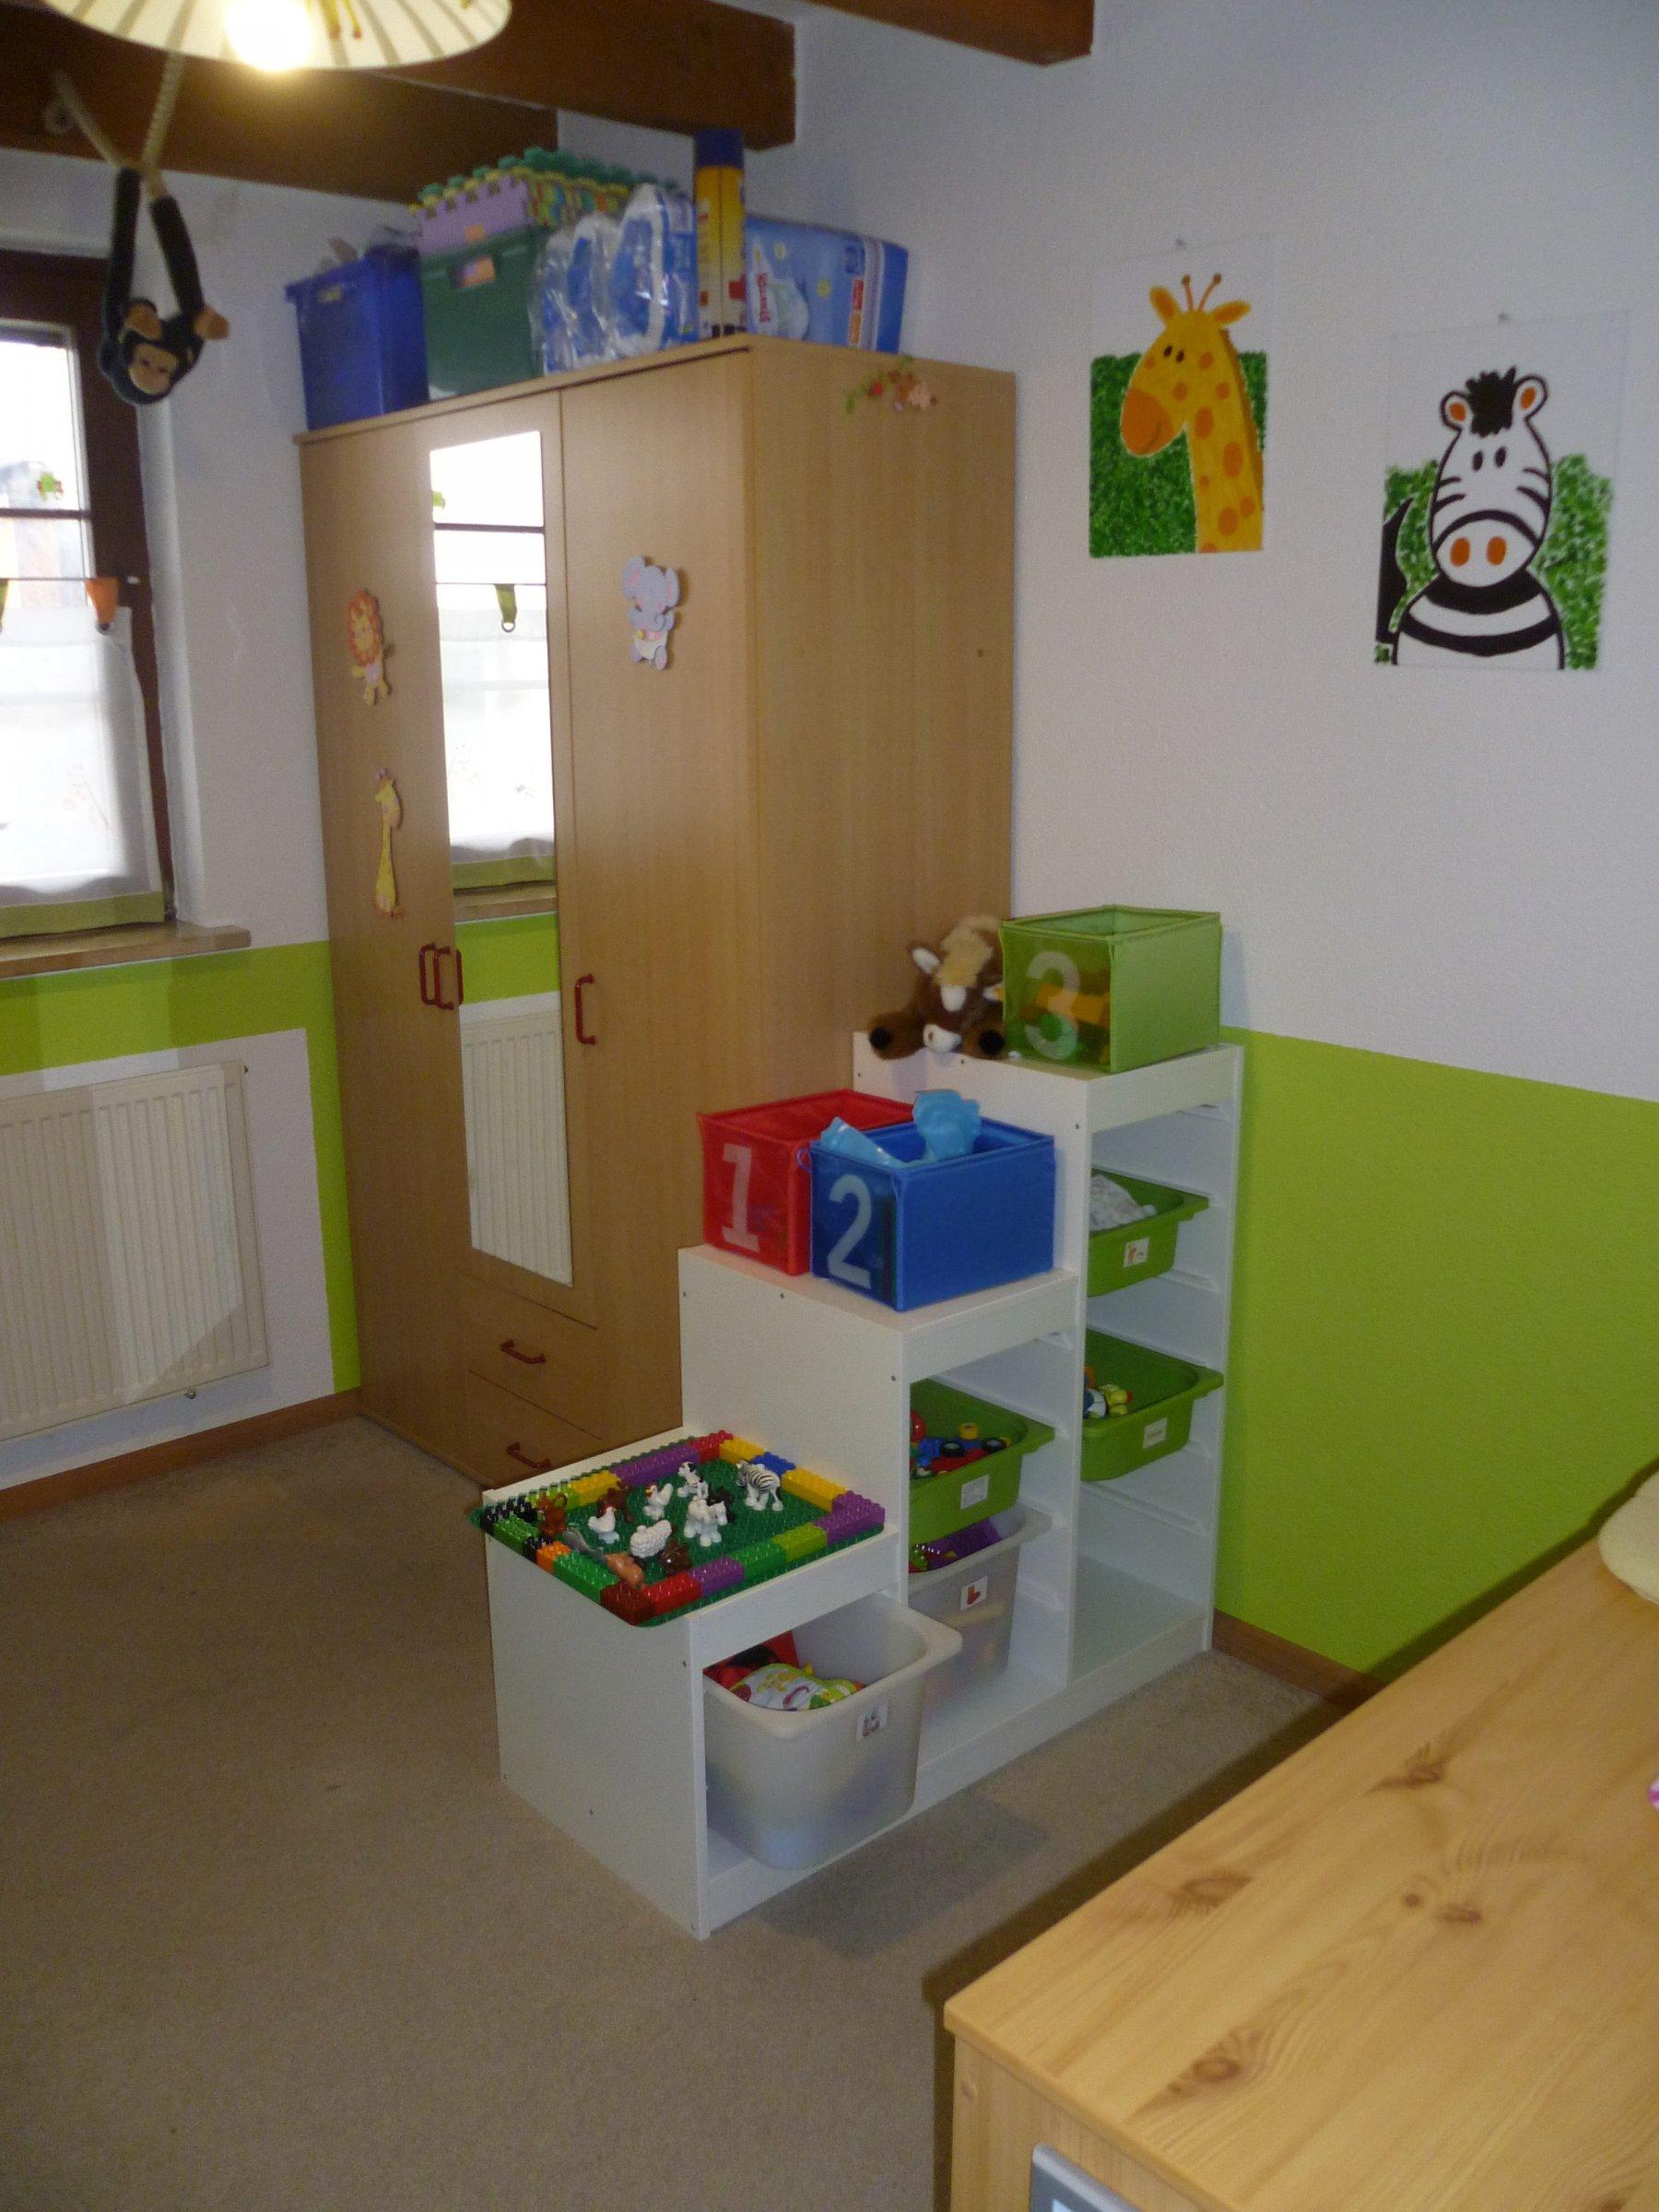 Kinderzimmer \'Kinderzimmer Dschungel\' - Kinderzimmer Dschungel ...